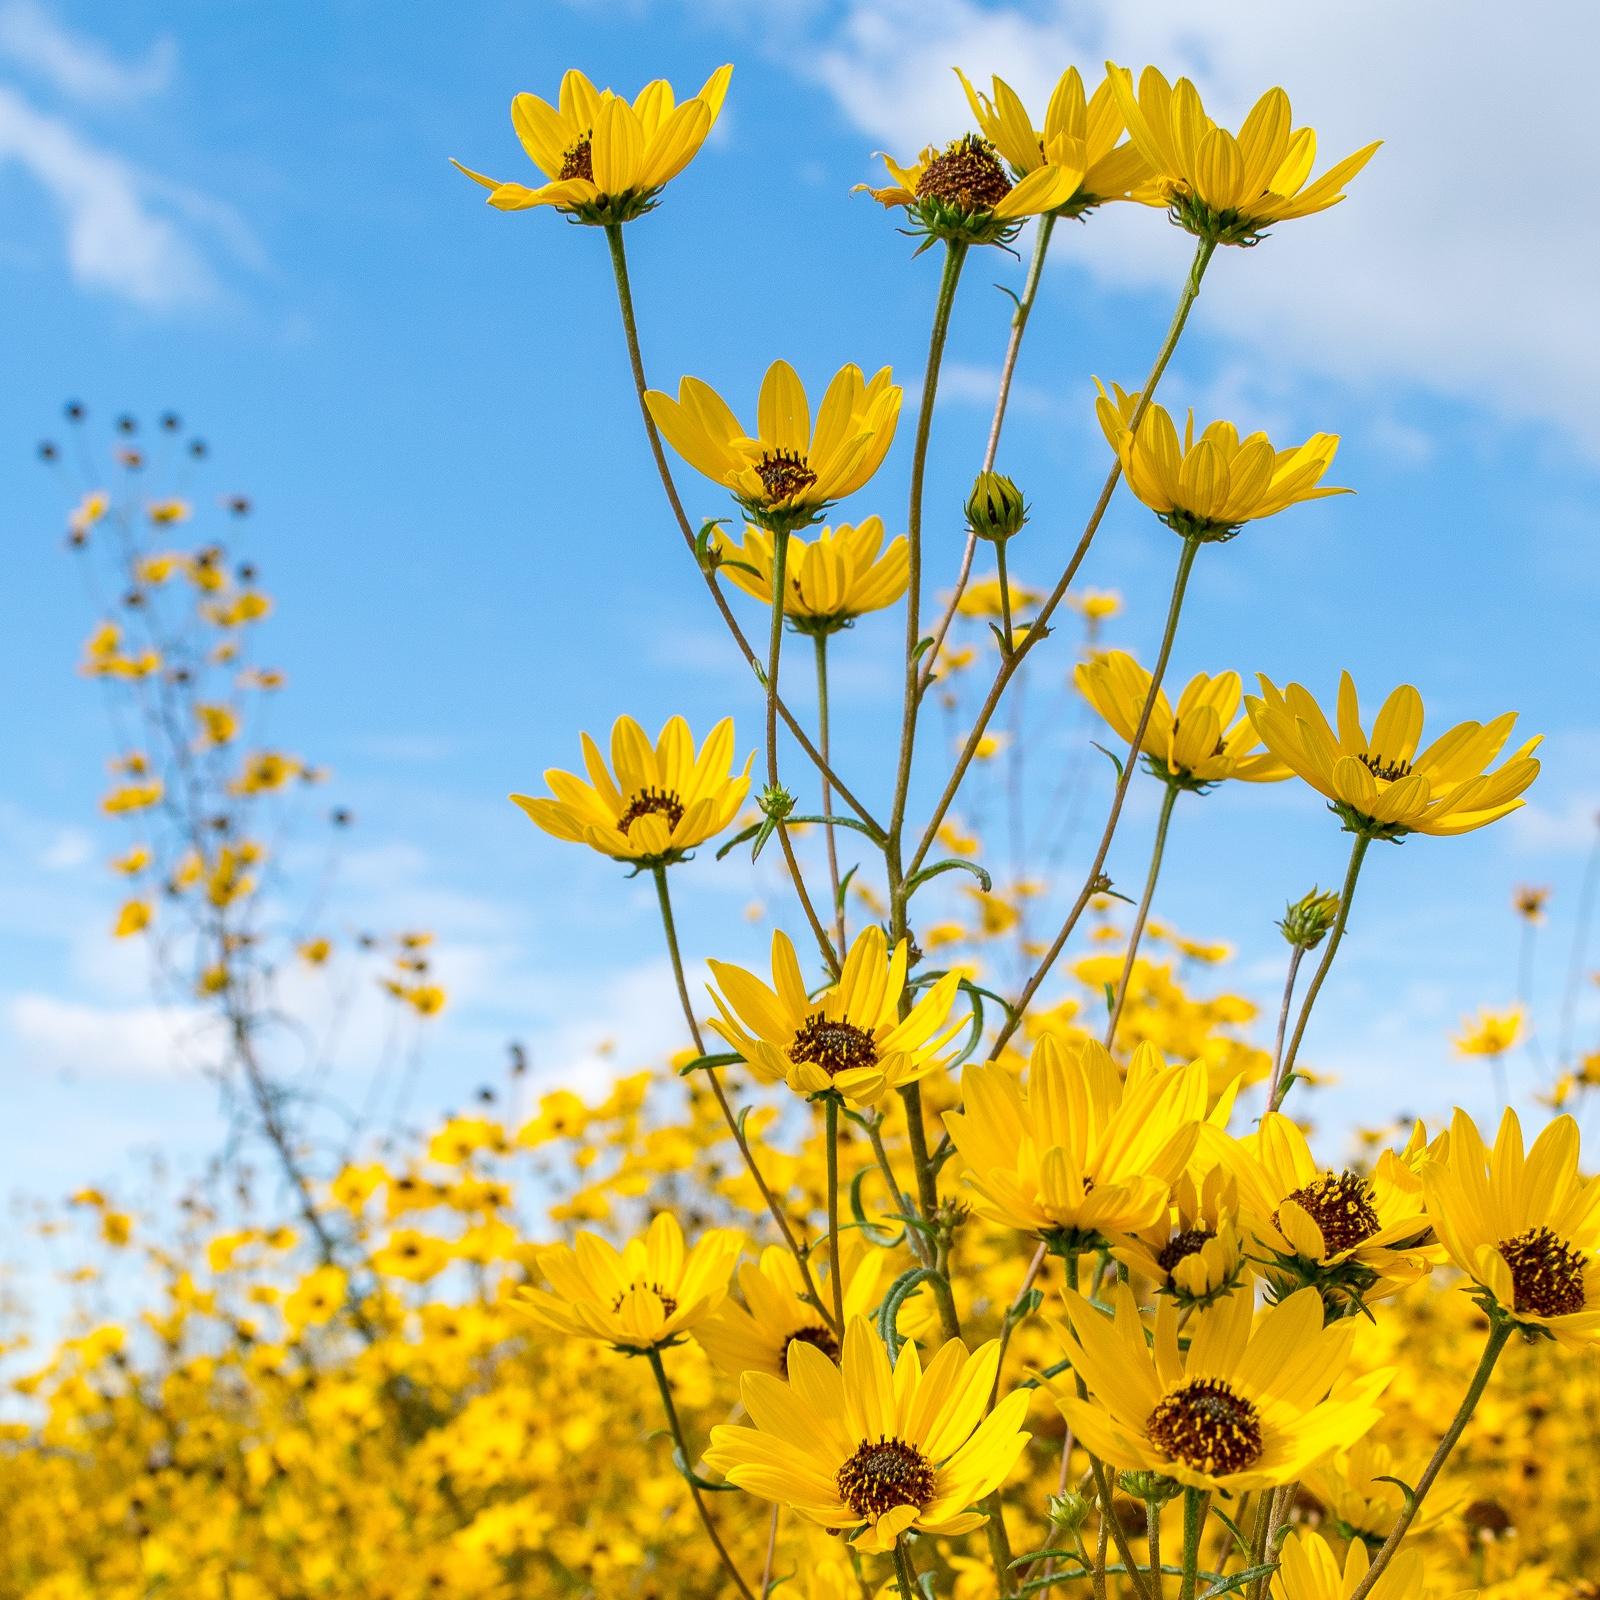 Narrow-leaved Sunflower bunch